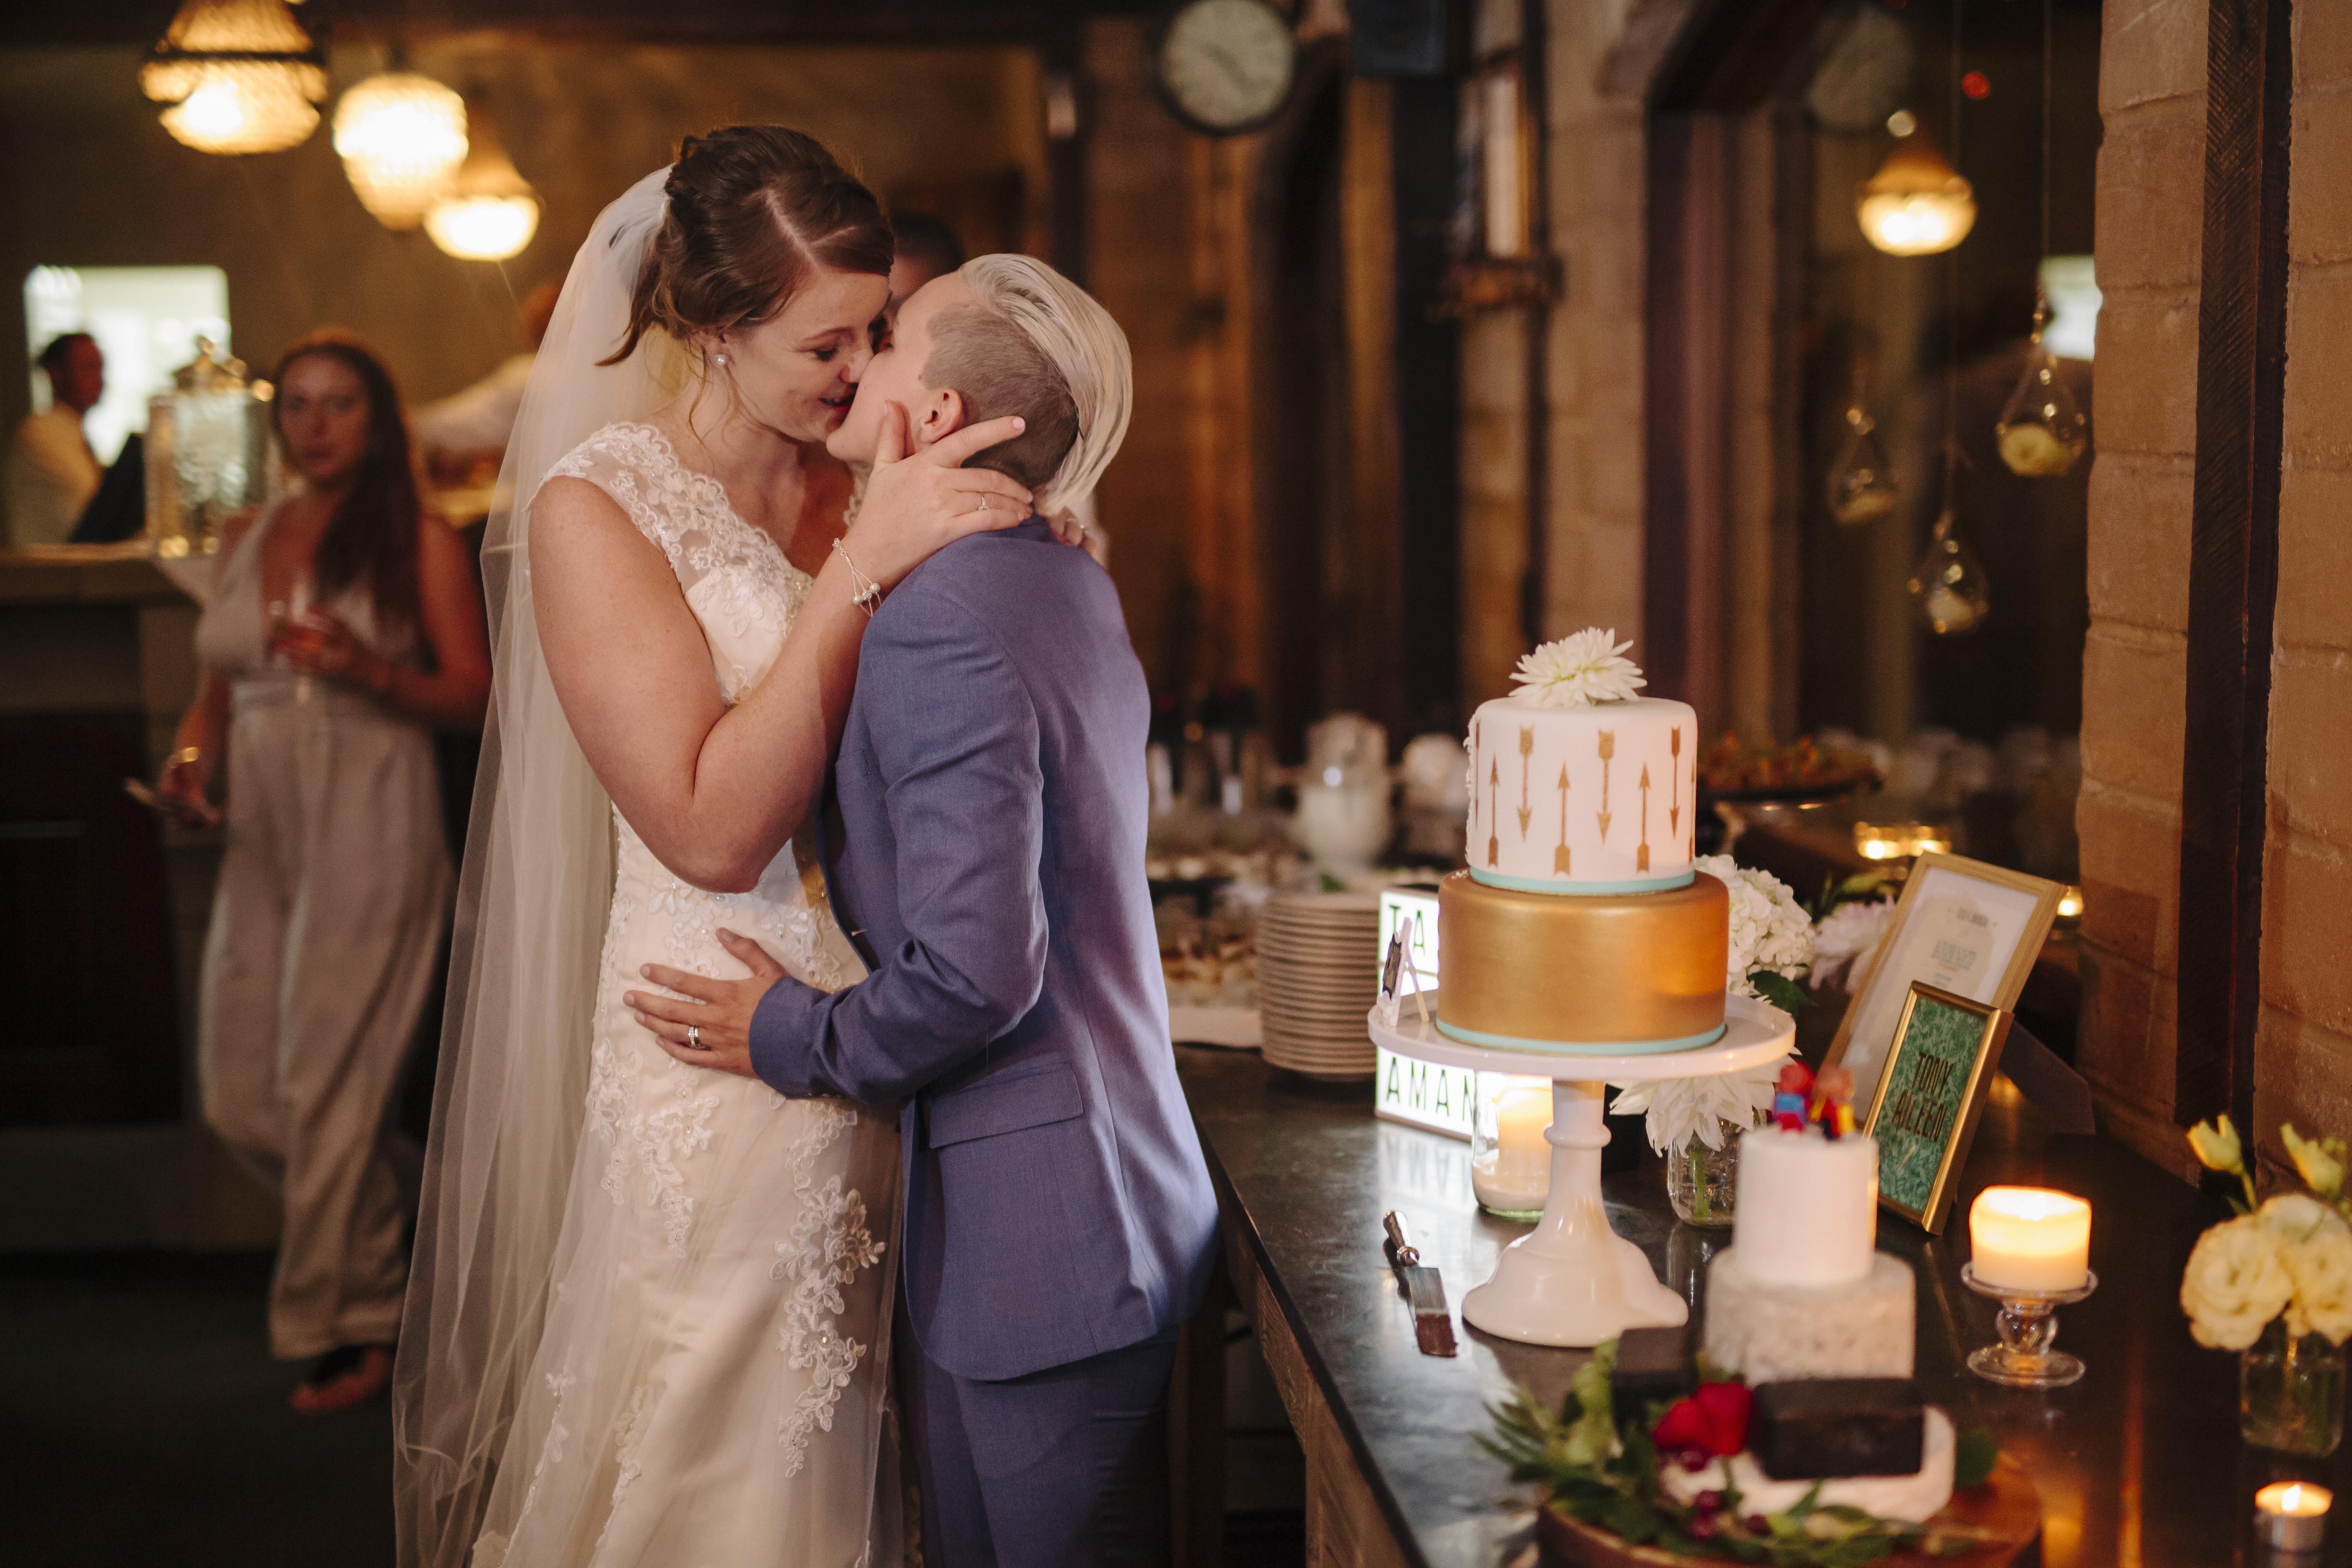 amanda-tash-the-official-photographers-wedding__mg_9804